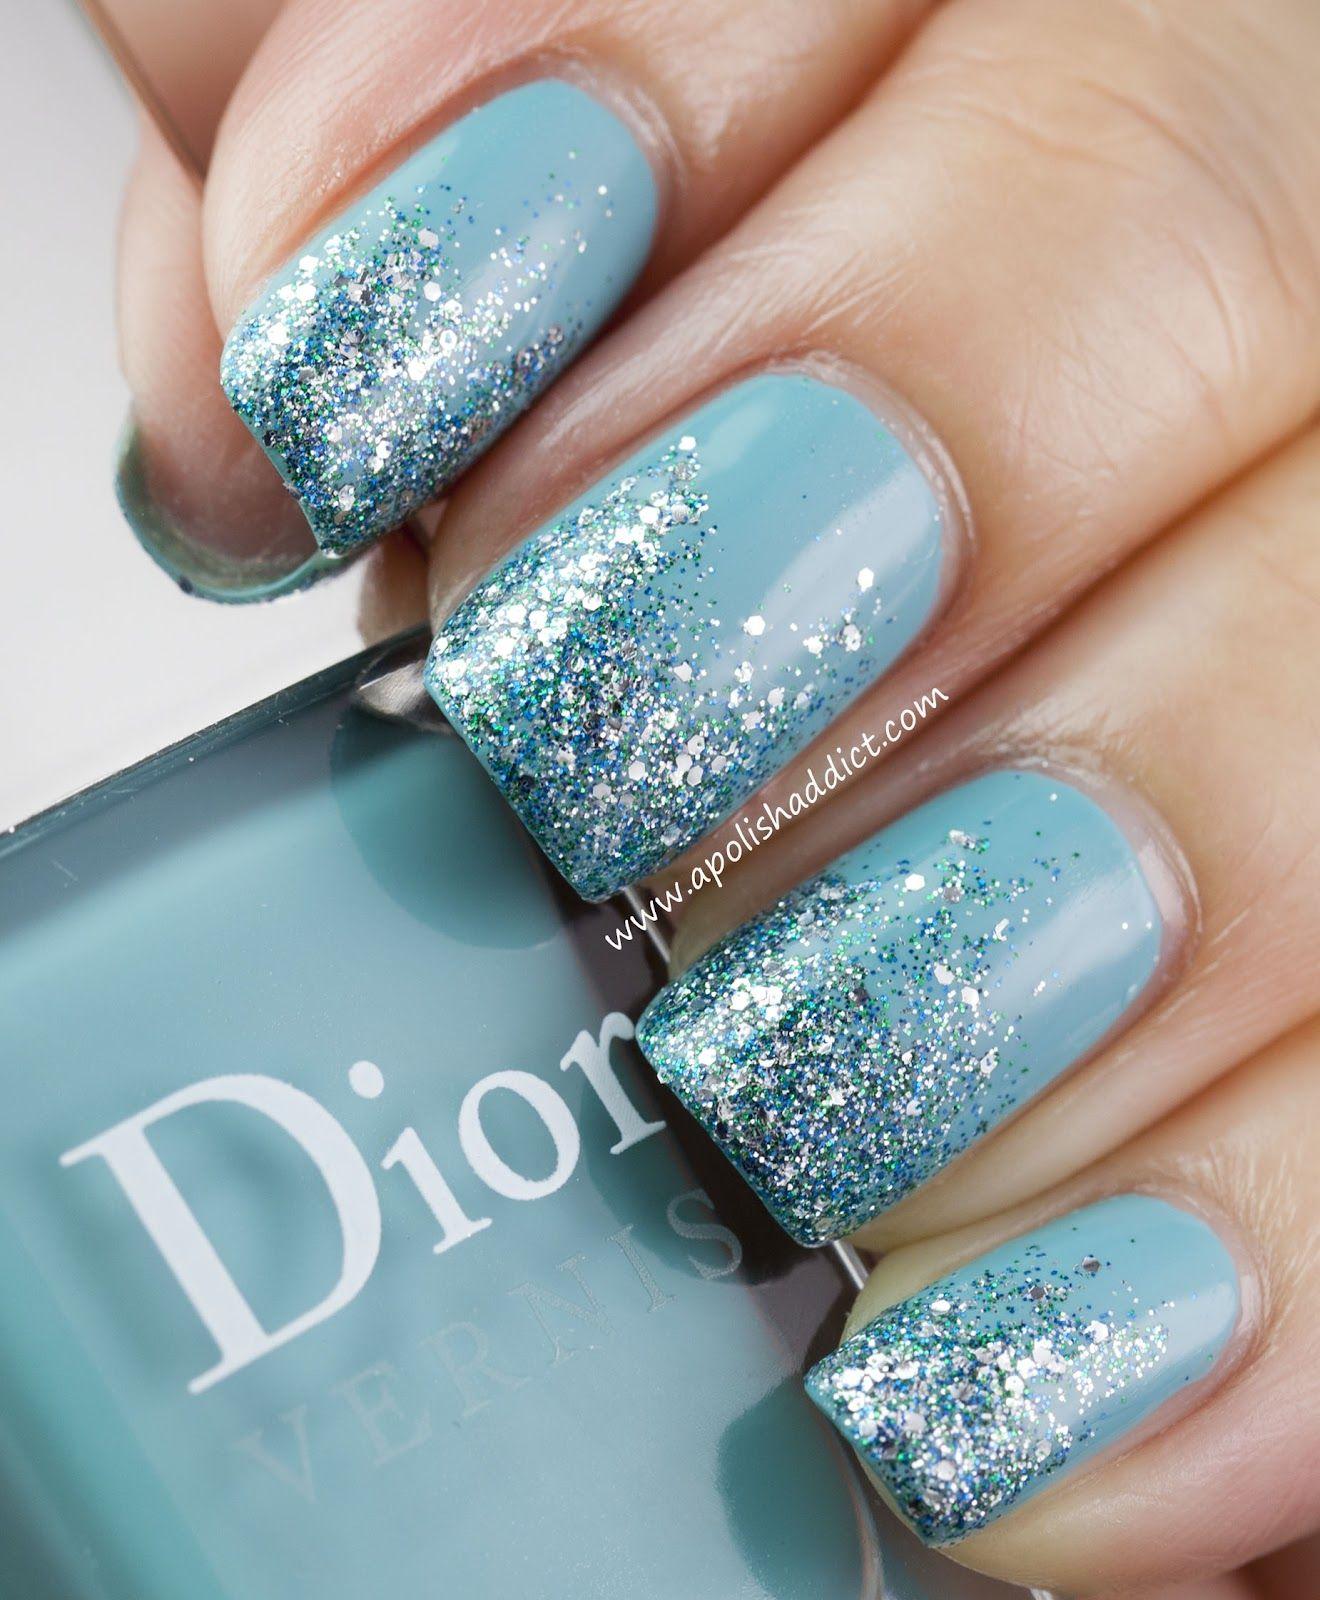 A Polish Addict: Glitter Tips with Dior Saint Tropez & Nails Inc Hammersmith